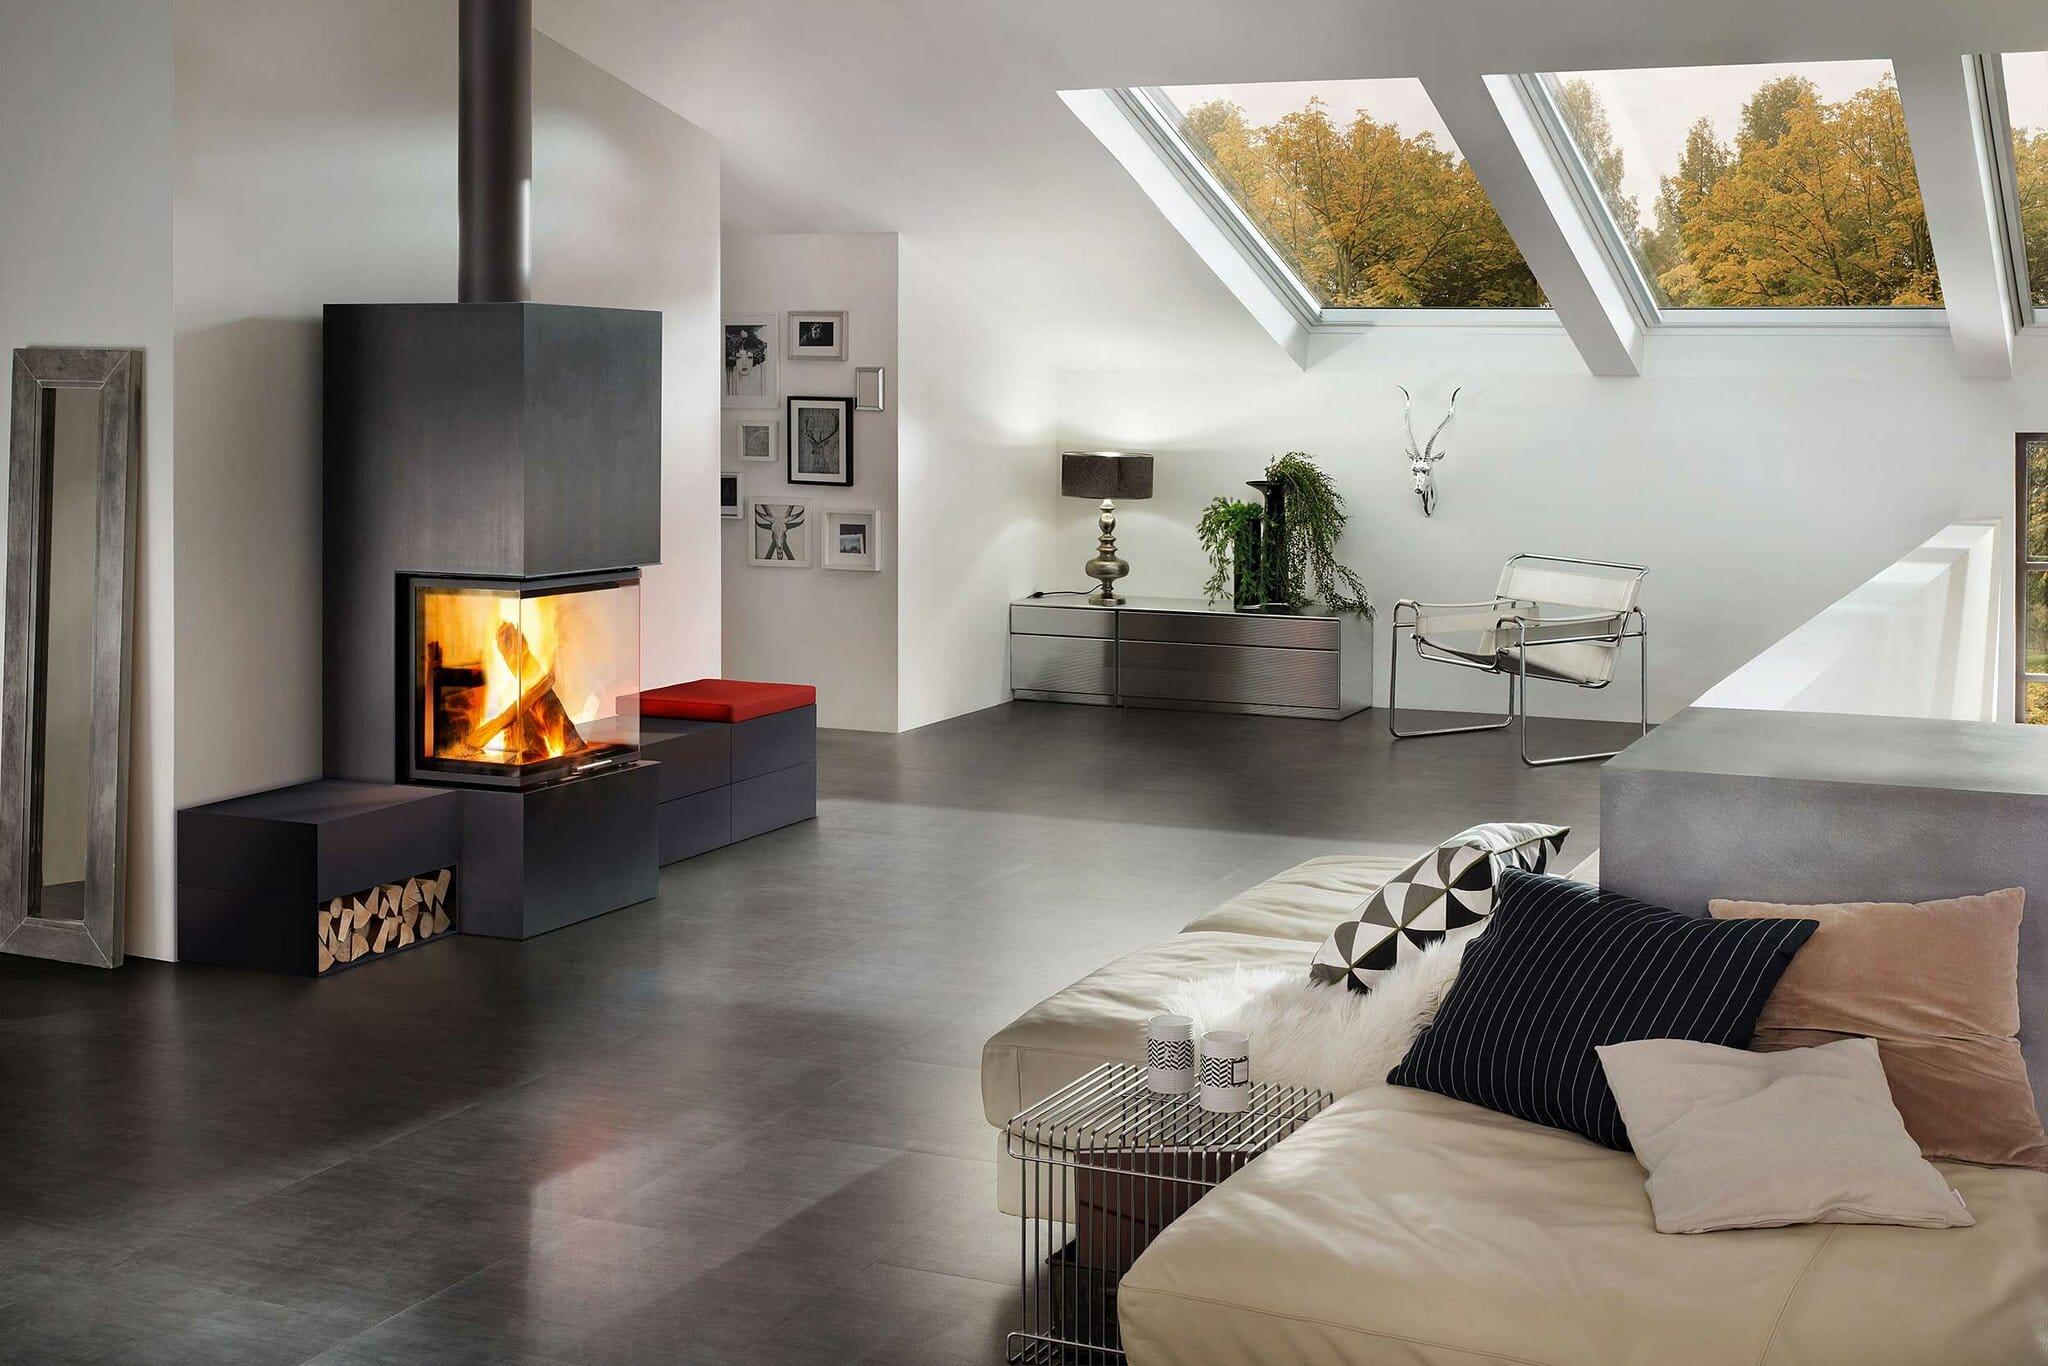 partner 36grad 36grad swissmade spaculture. Black Bedroom Furniture Sets. Home Design Ideas